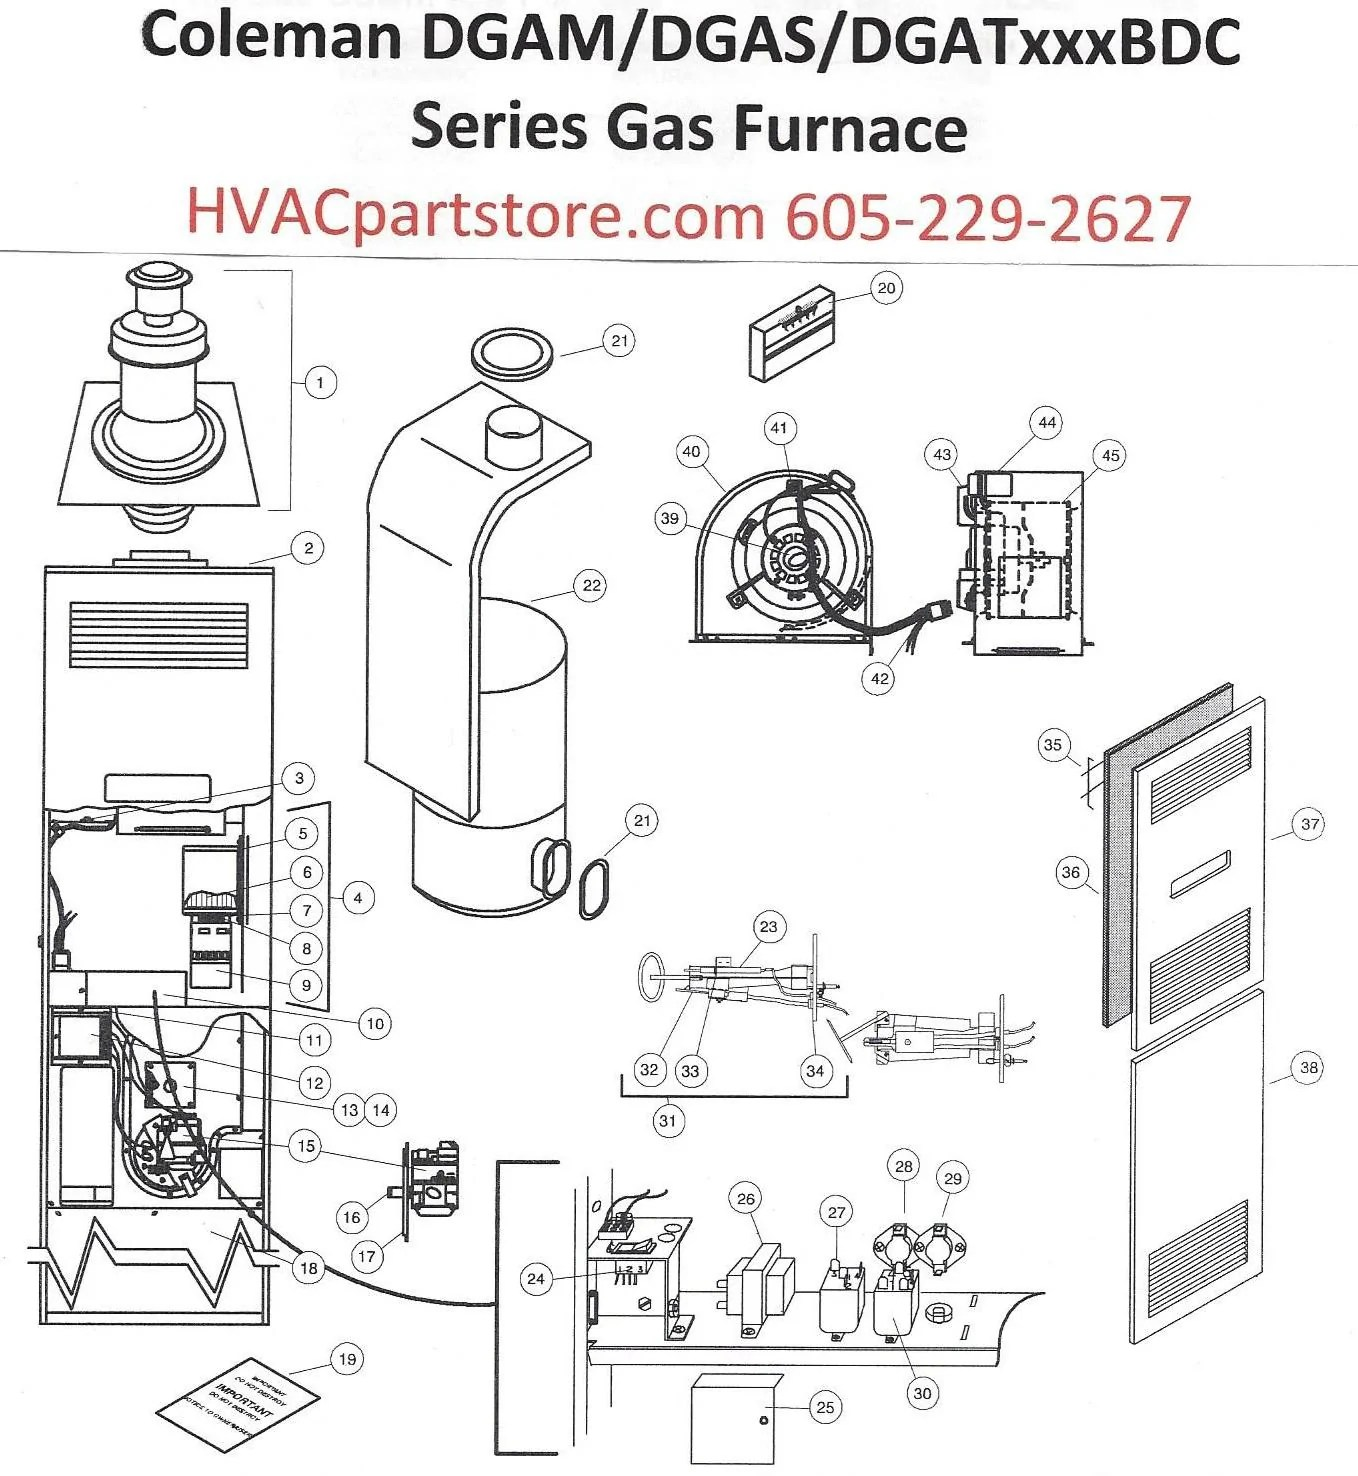 coleman furnace schematics wiring diagram hub oil furnace wiring diagram coleman gas furnace wiring diagram [ 1358 x 1476 Pixel ]